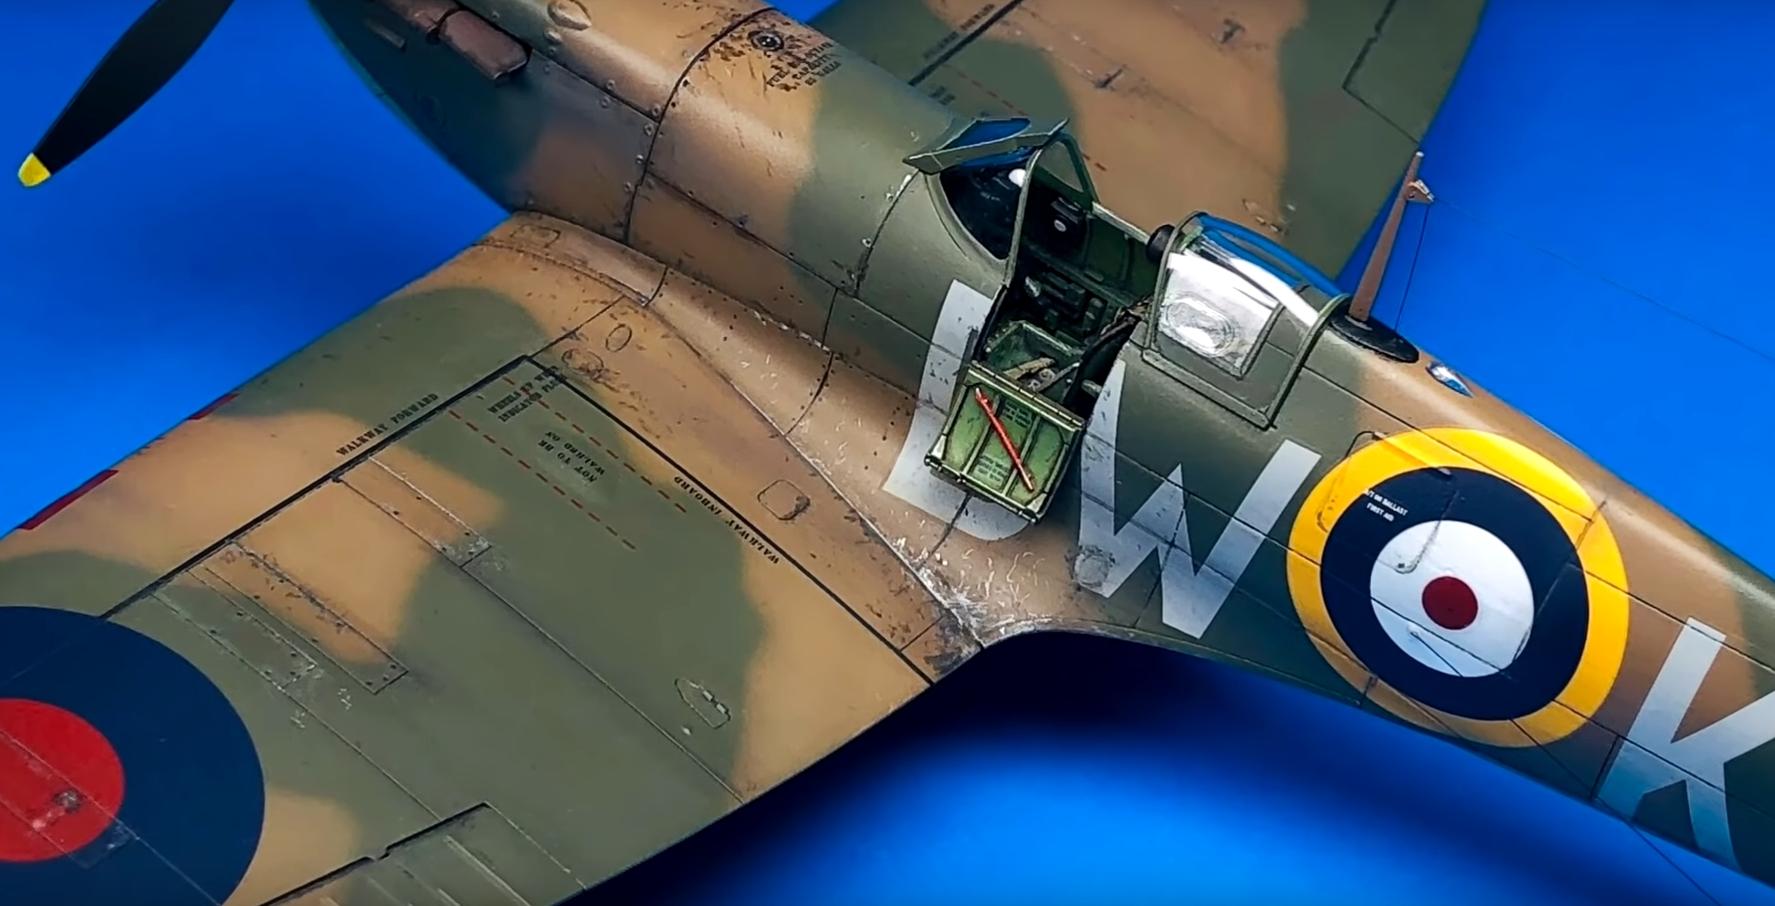 TAMIYA America, Inc 1/48 Supermarine Spitfire Mk.I, TAM61119 Review – Features, Pros & Cons